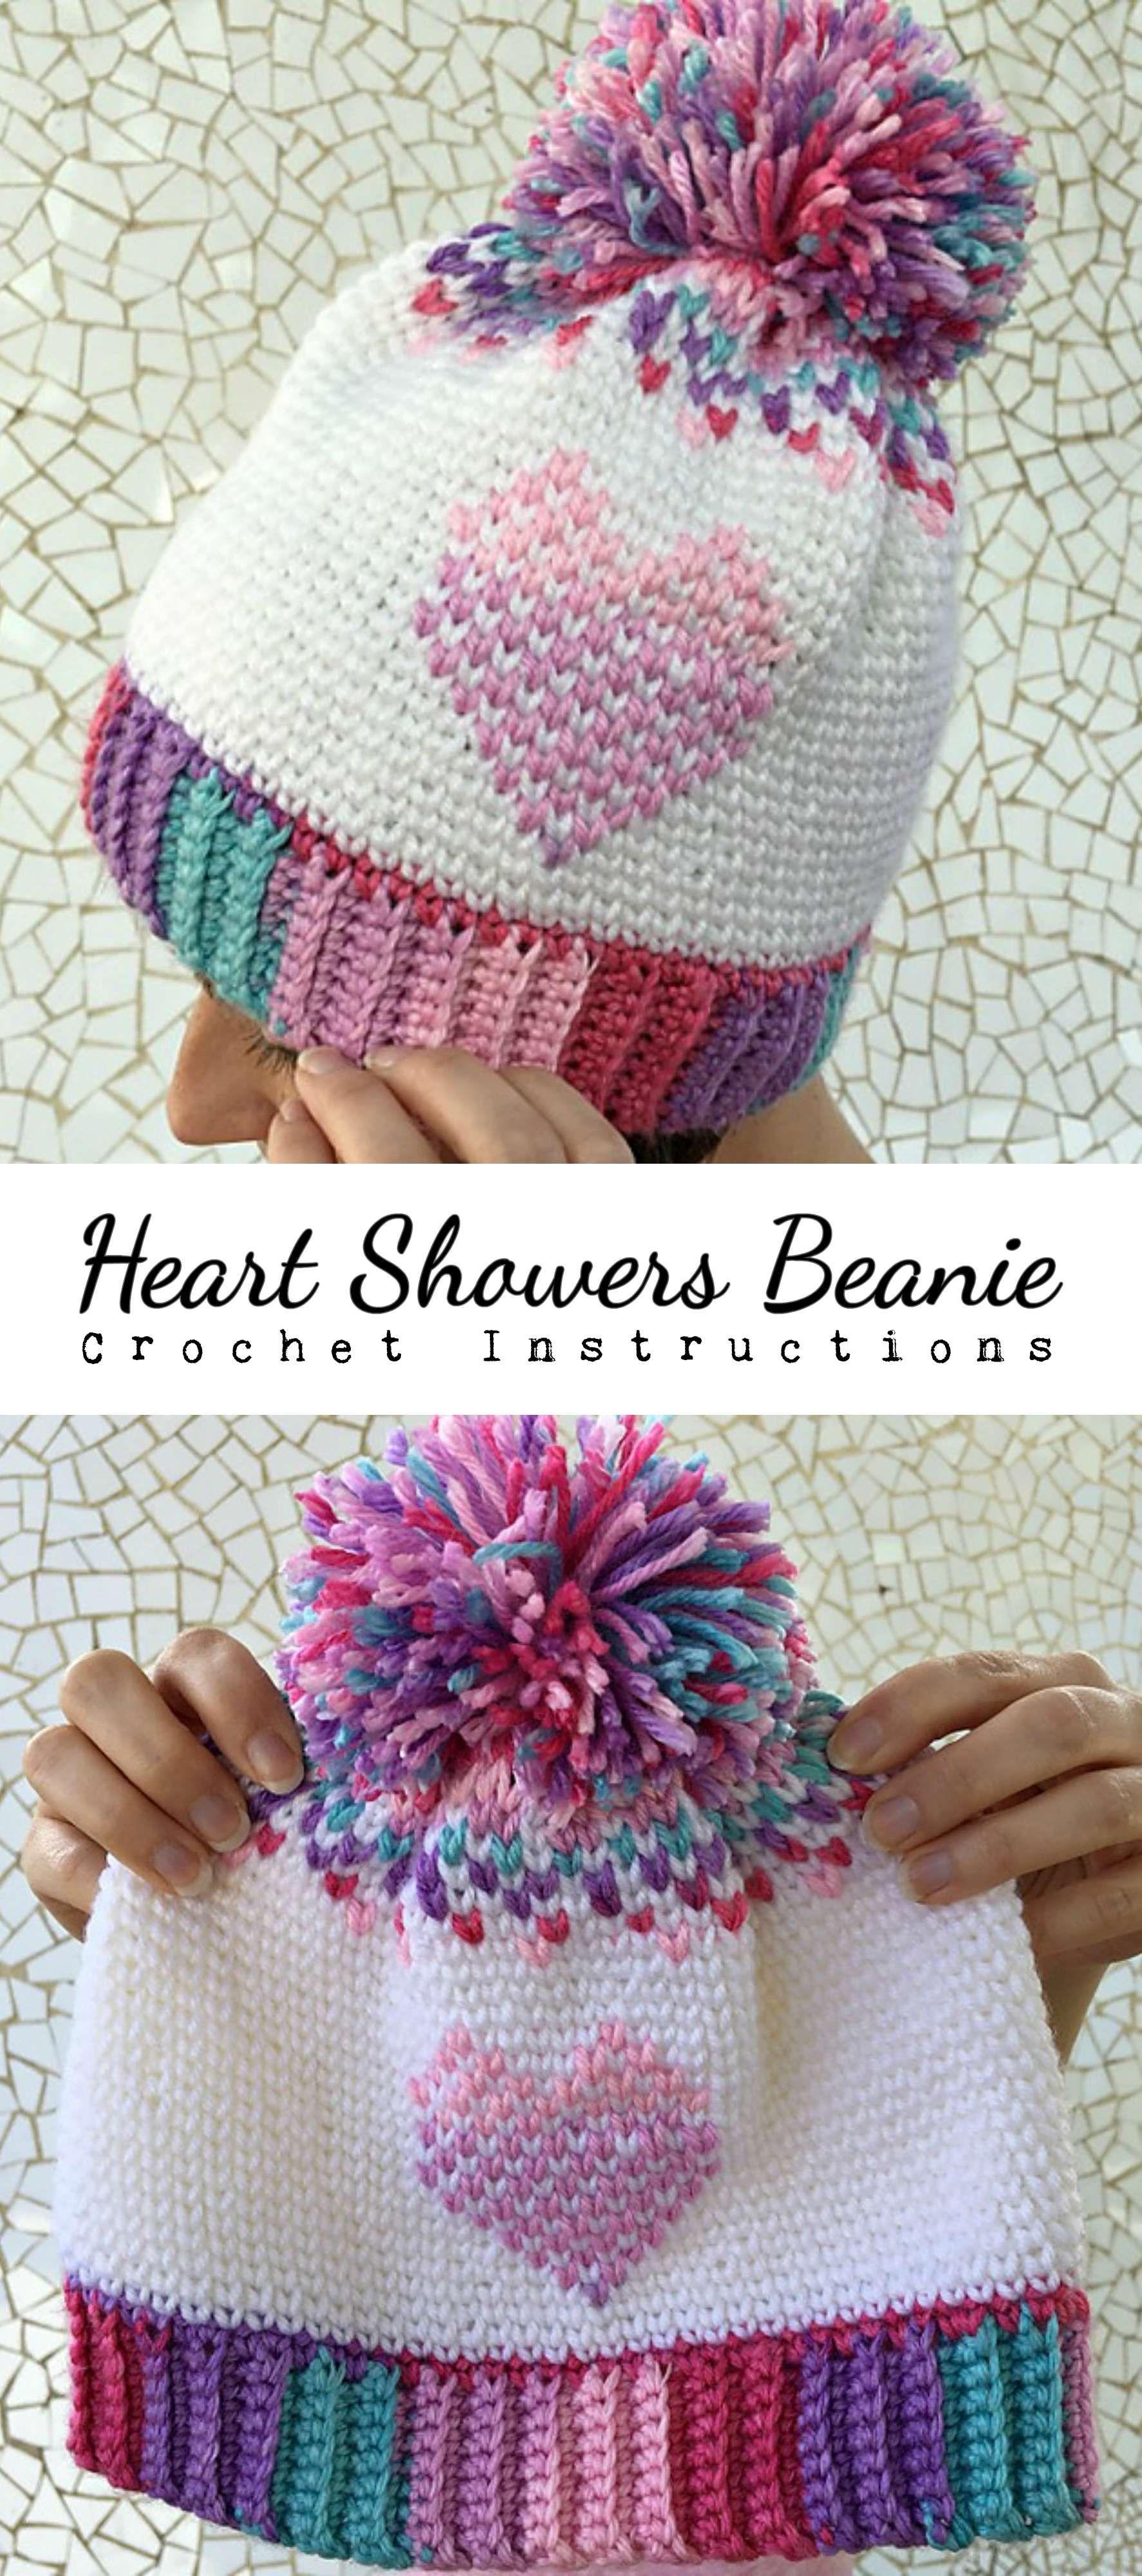 Crochet Heart Showers Beanie | CrochetHolic - HilariaFina ...